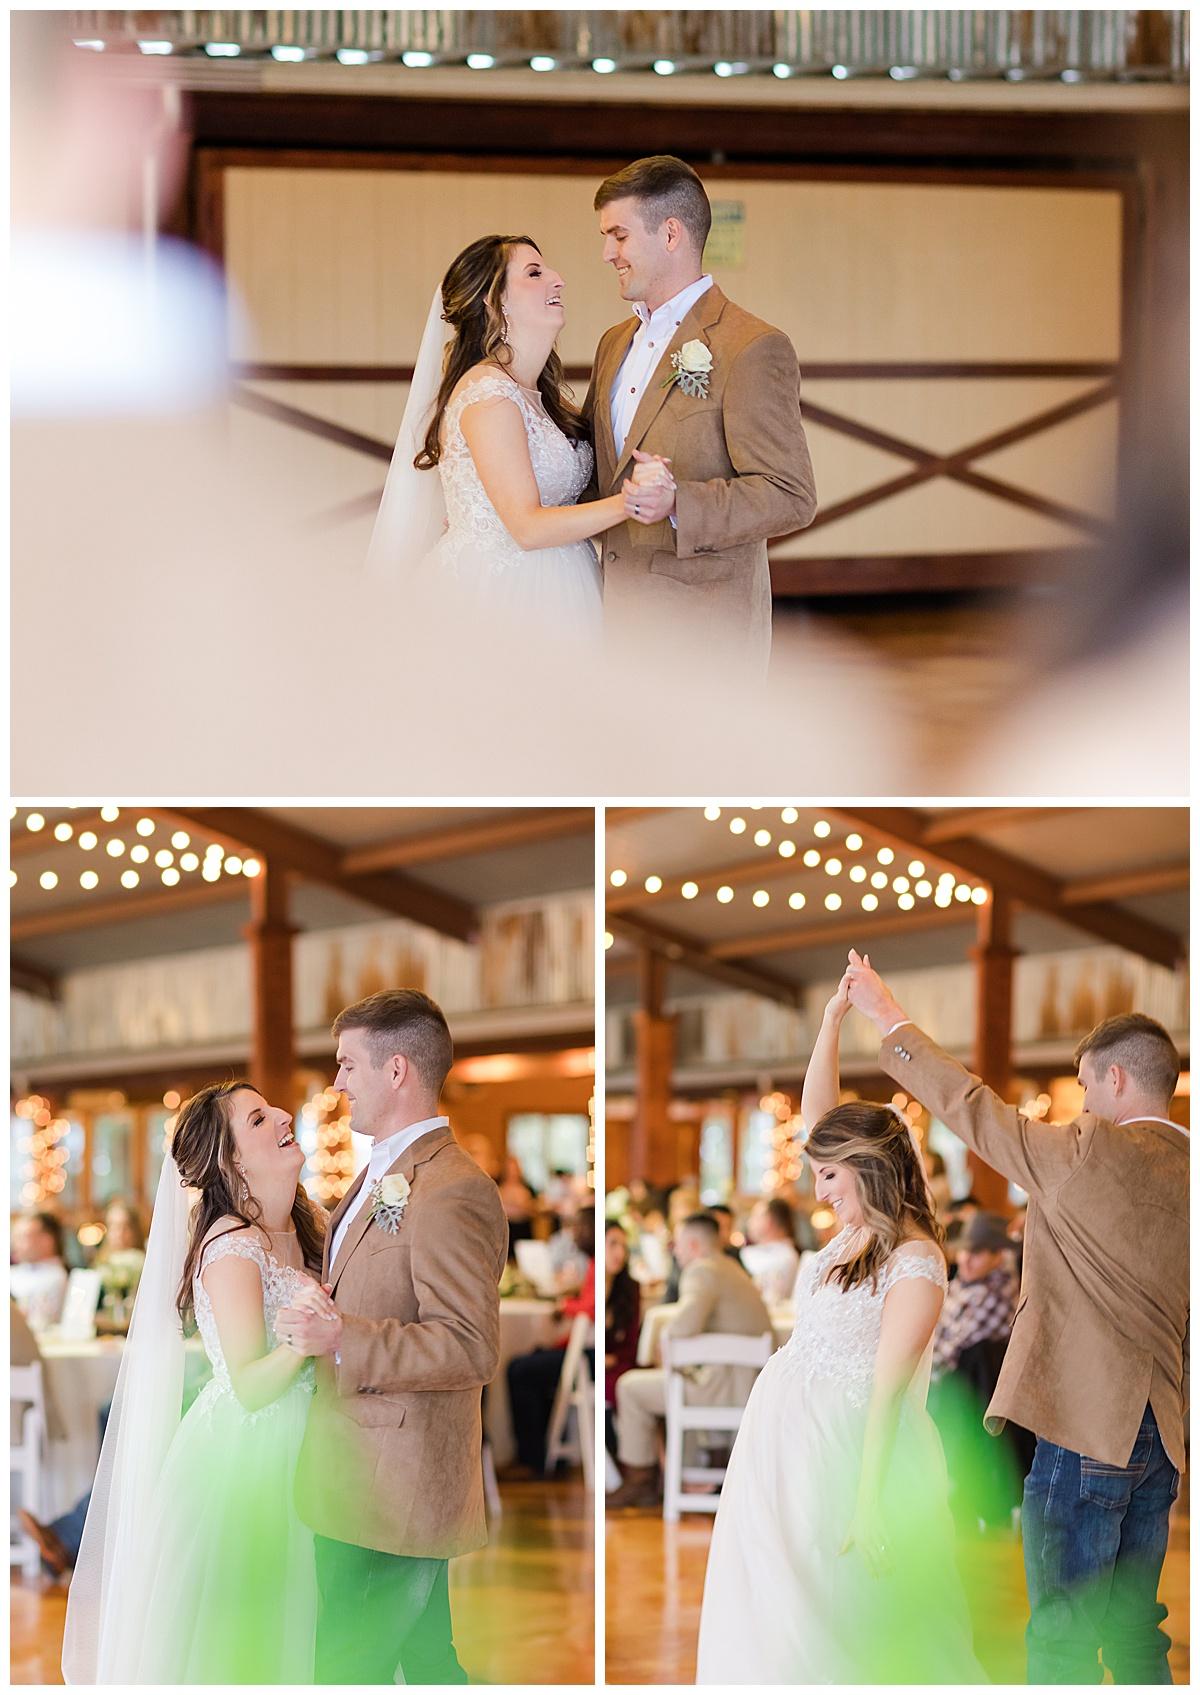 Wedding-Photographer-Texas-Hill-Country-Happy-H-Ranch-Comfor-Texas-Carly-Barton-Photography_0067.jpg